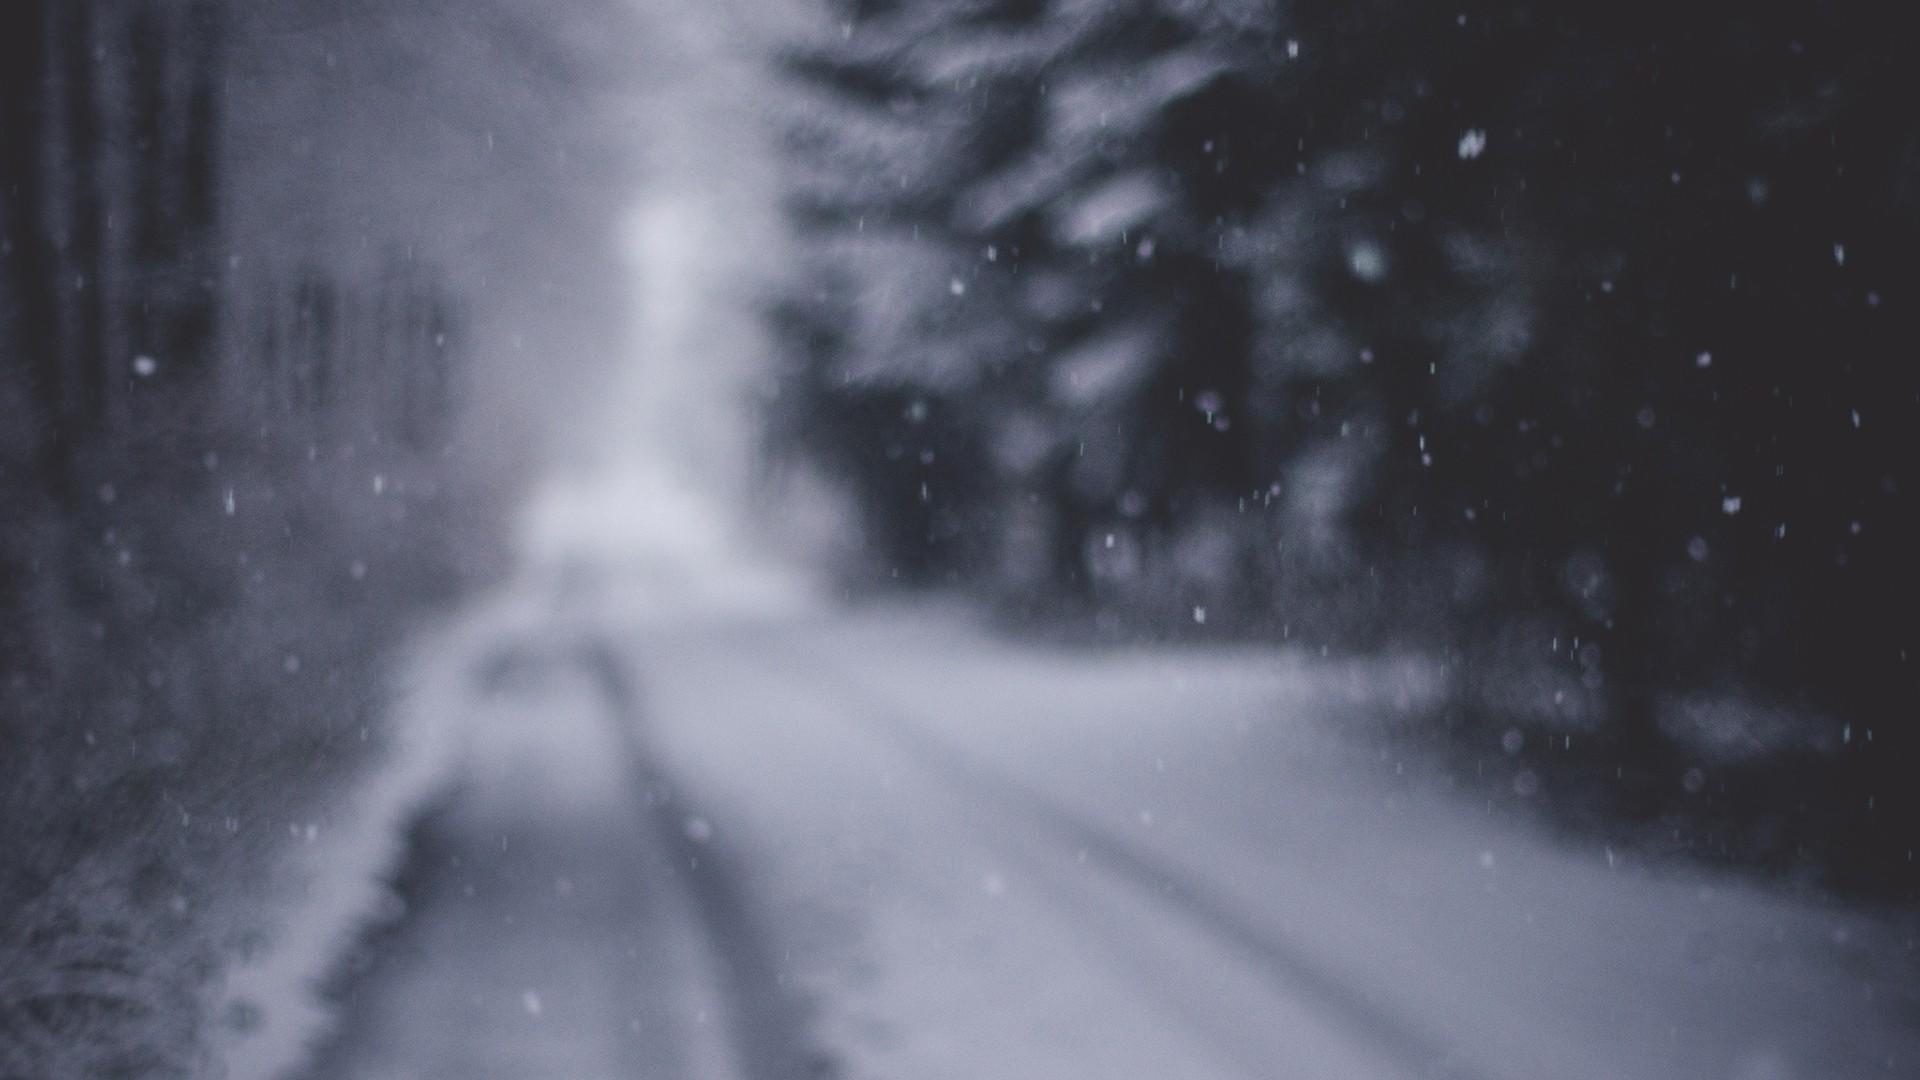 General 1920x1080 snow blurred winter road snowing gloomy gray